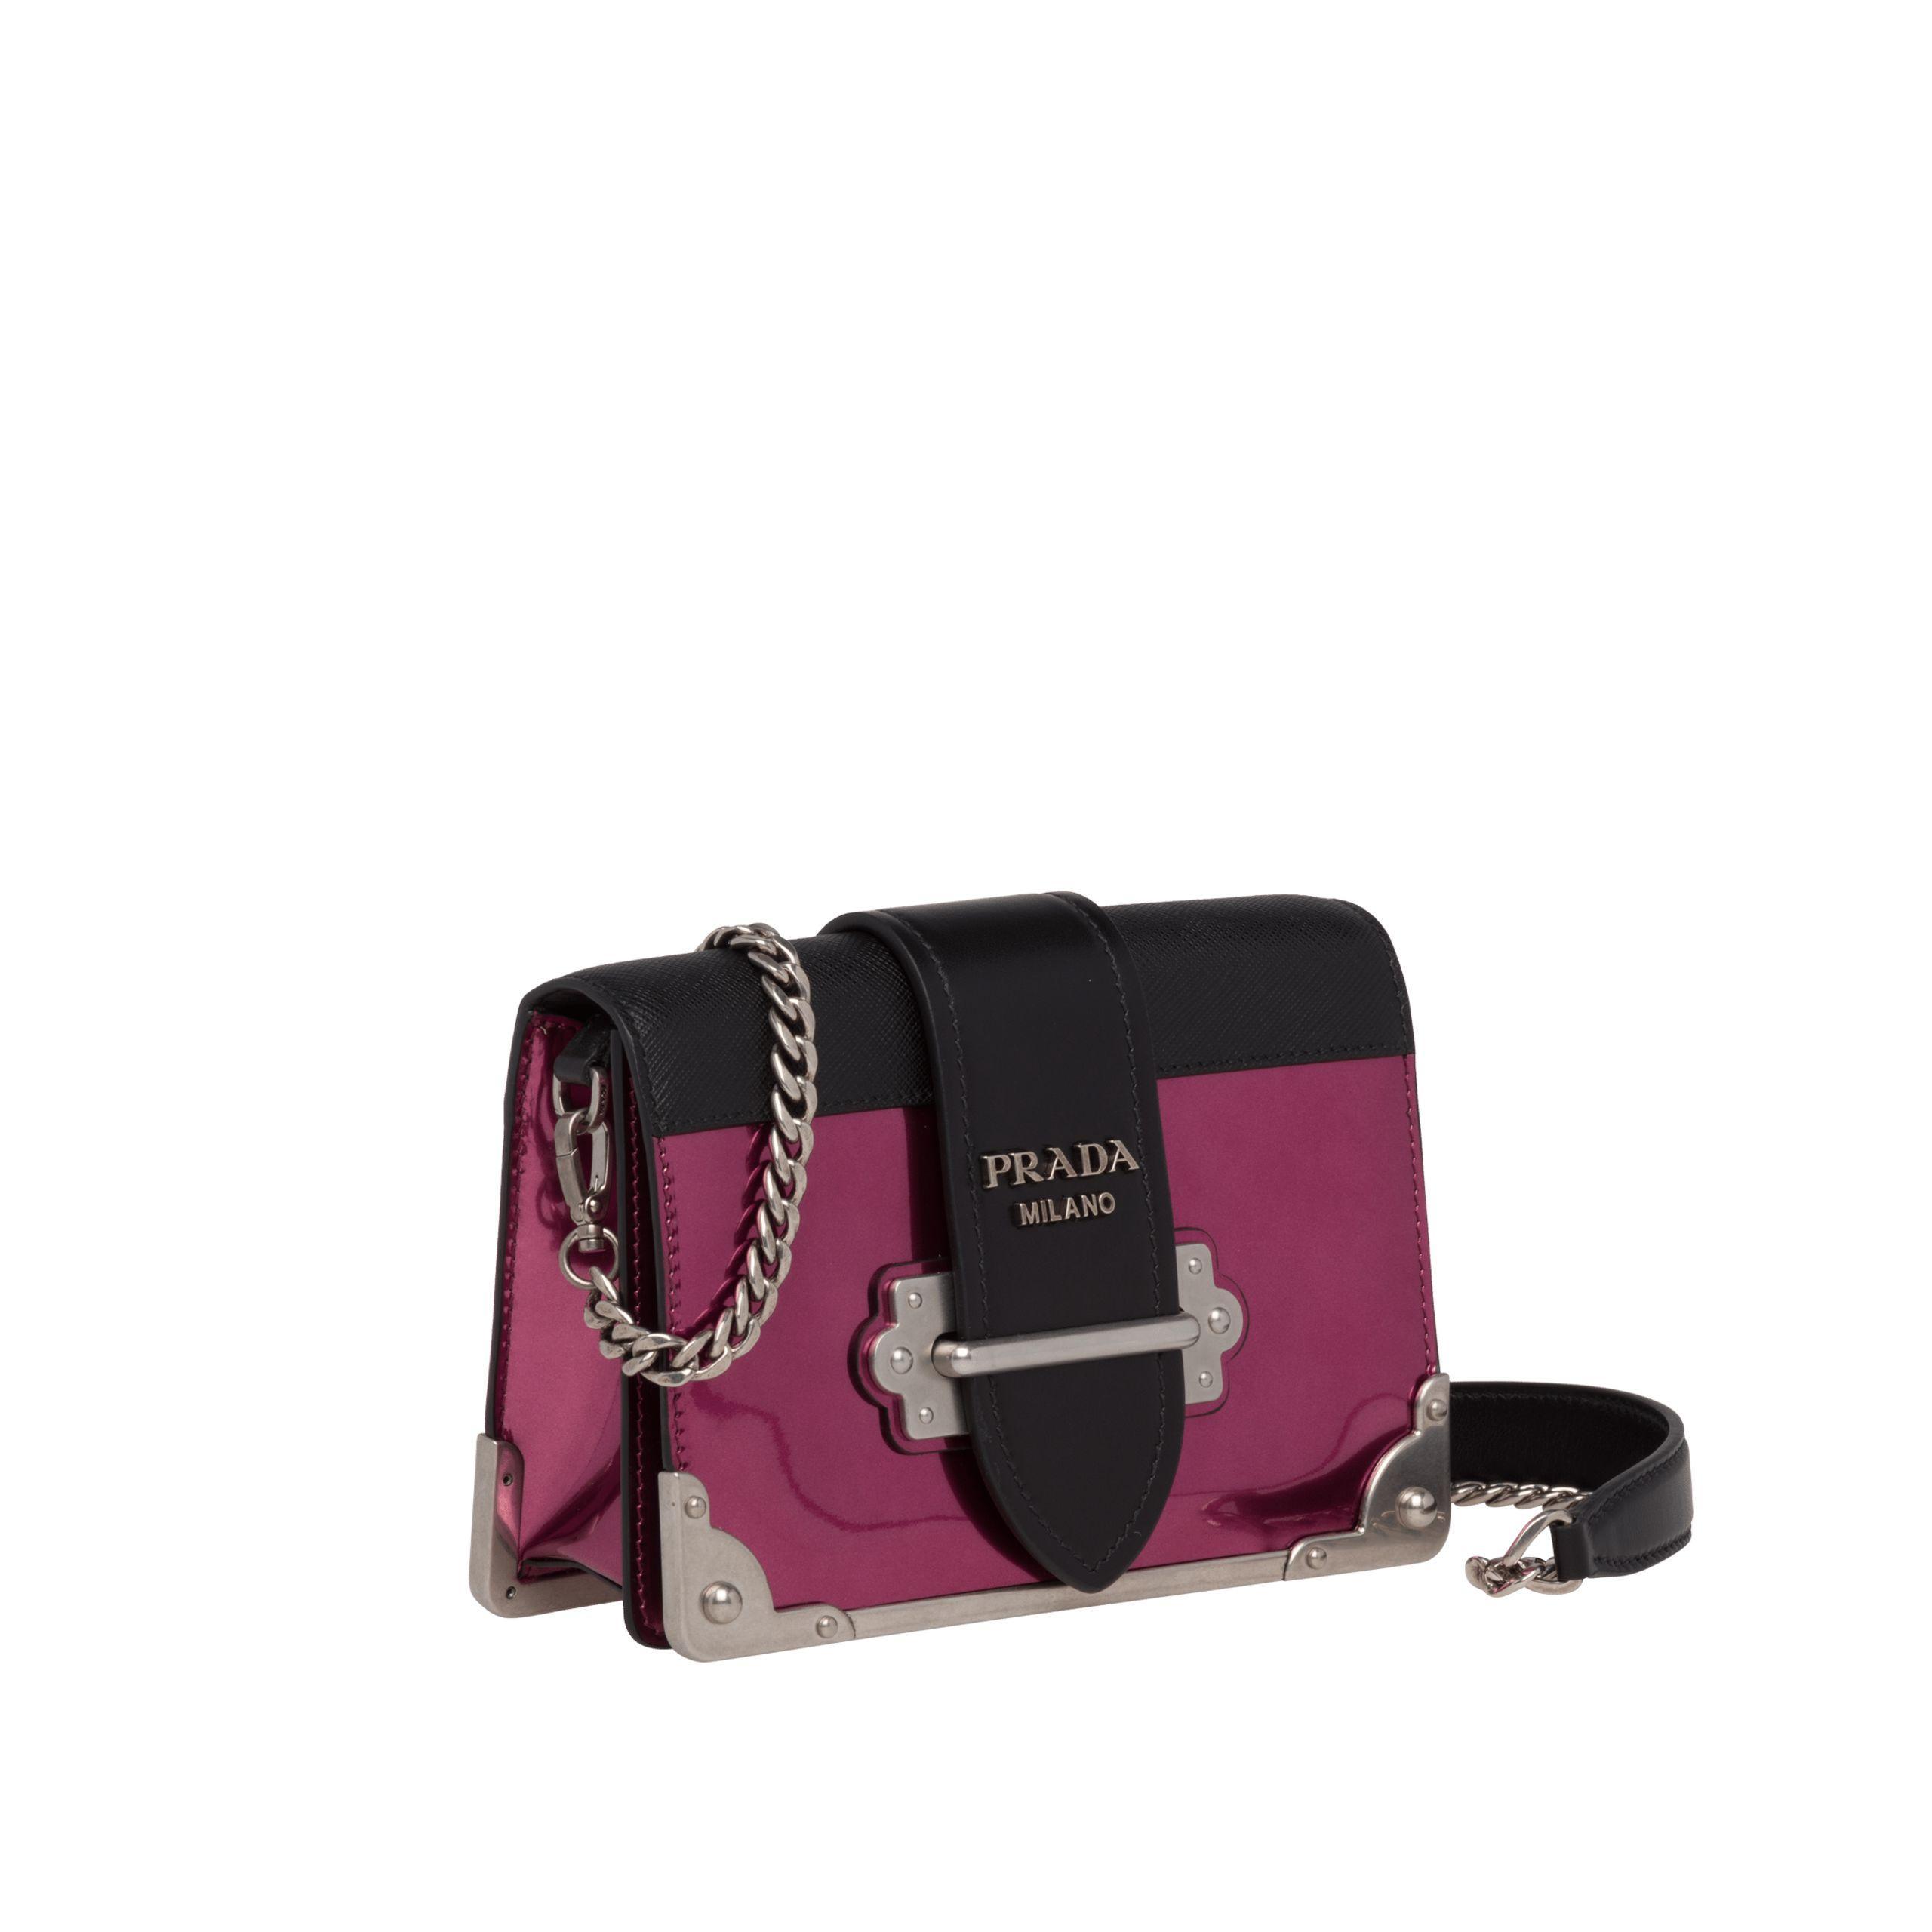 cbd9205bc194 Prada - Multicolor Cahier Leather Shoulder Bag - Lyst. View fullscreen